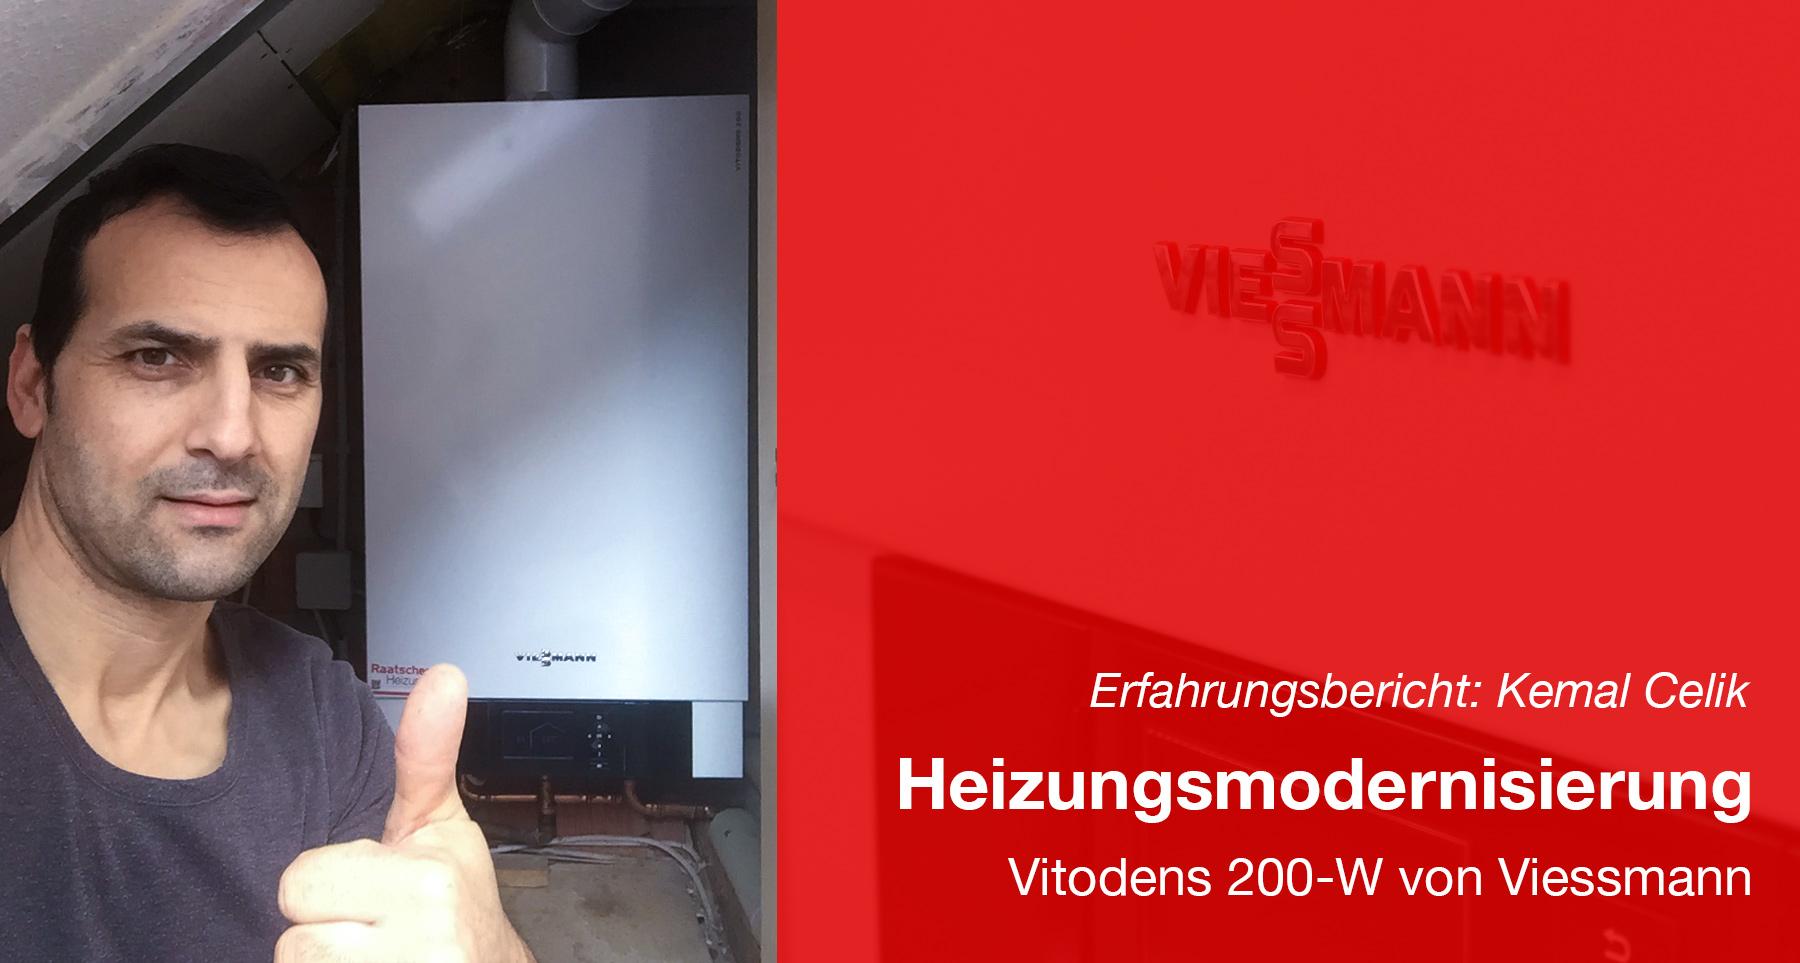 Heizungserneuerung Modernisierung Heizung Referenz Raatschen Heizung NRW